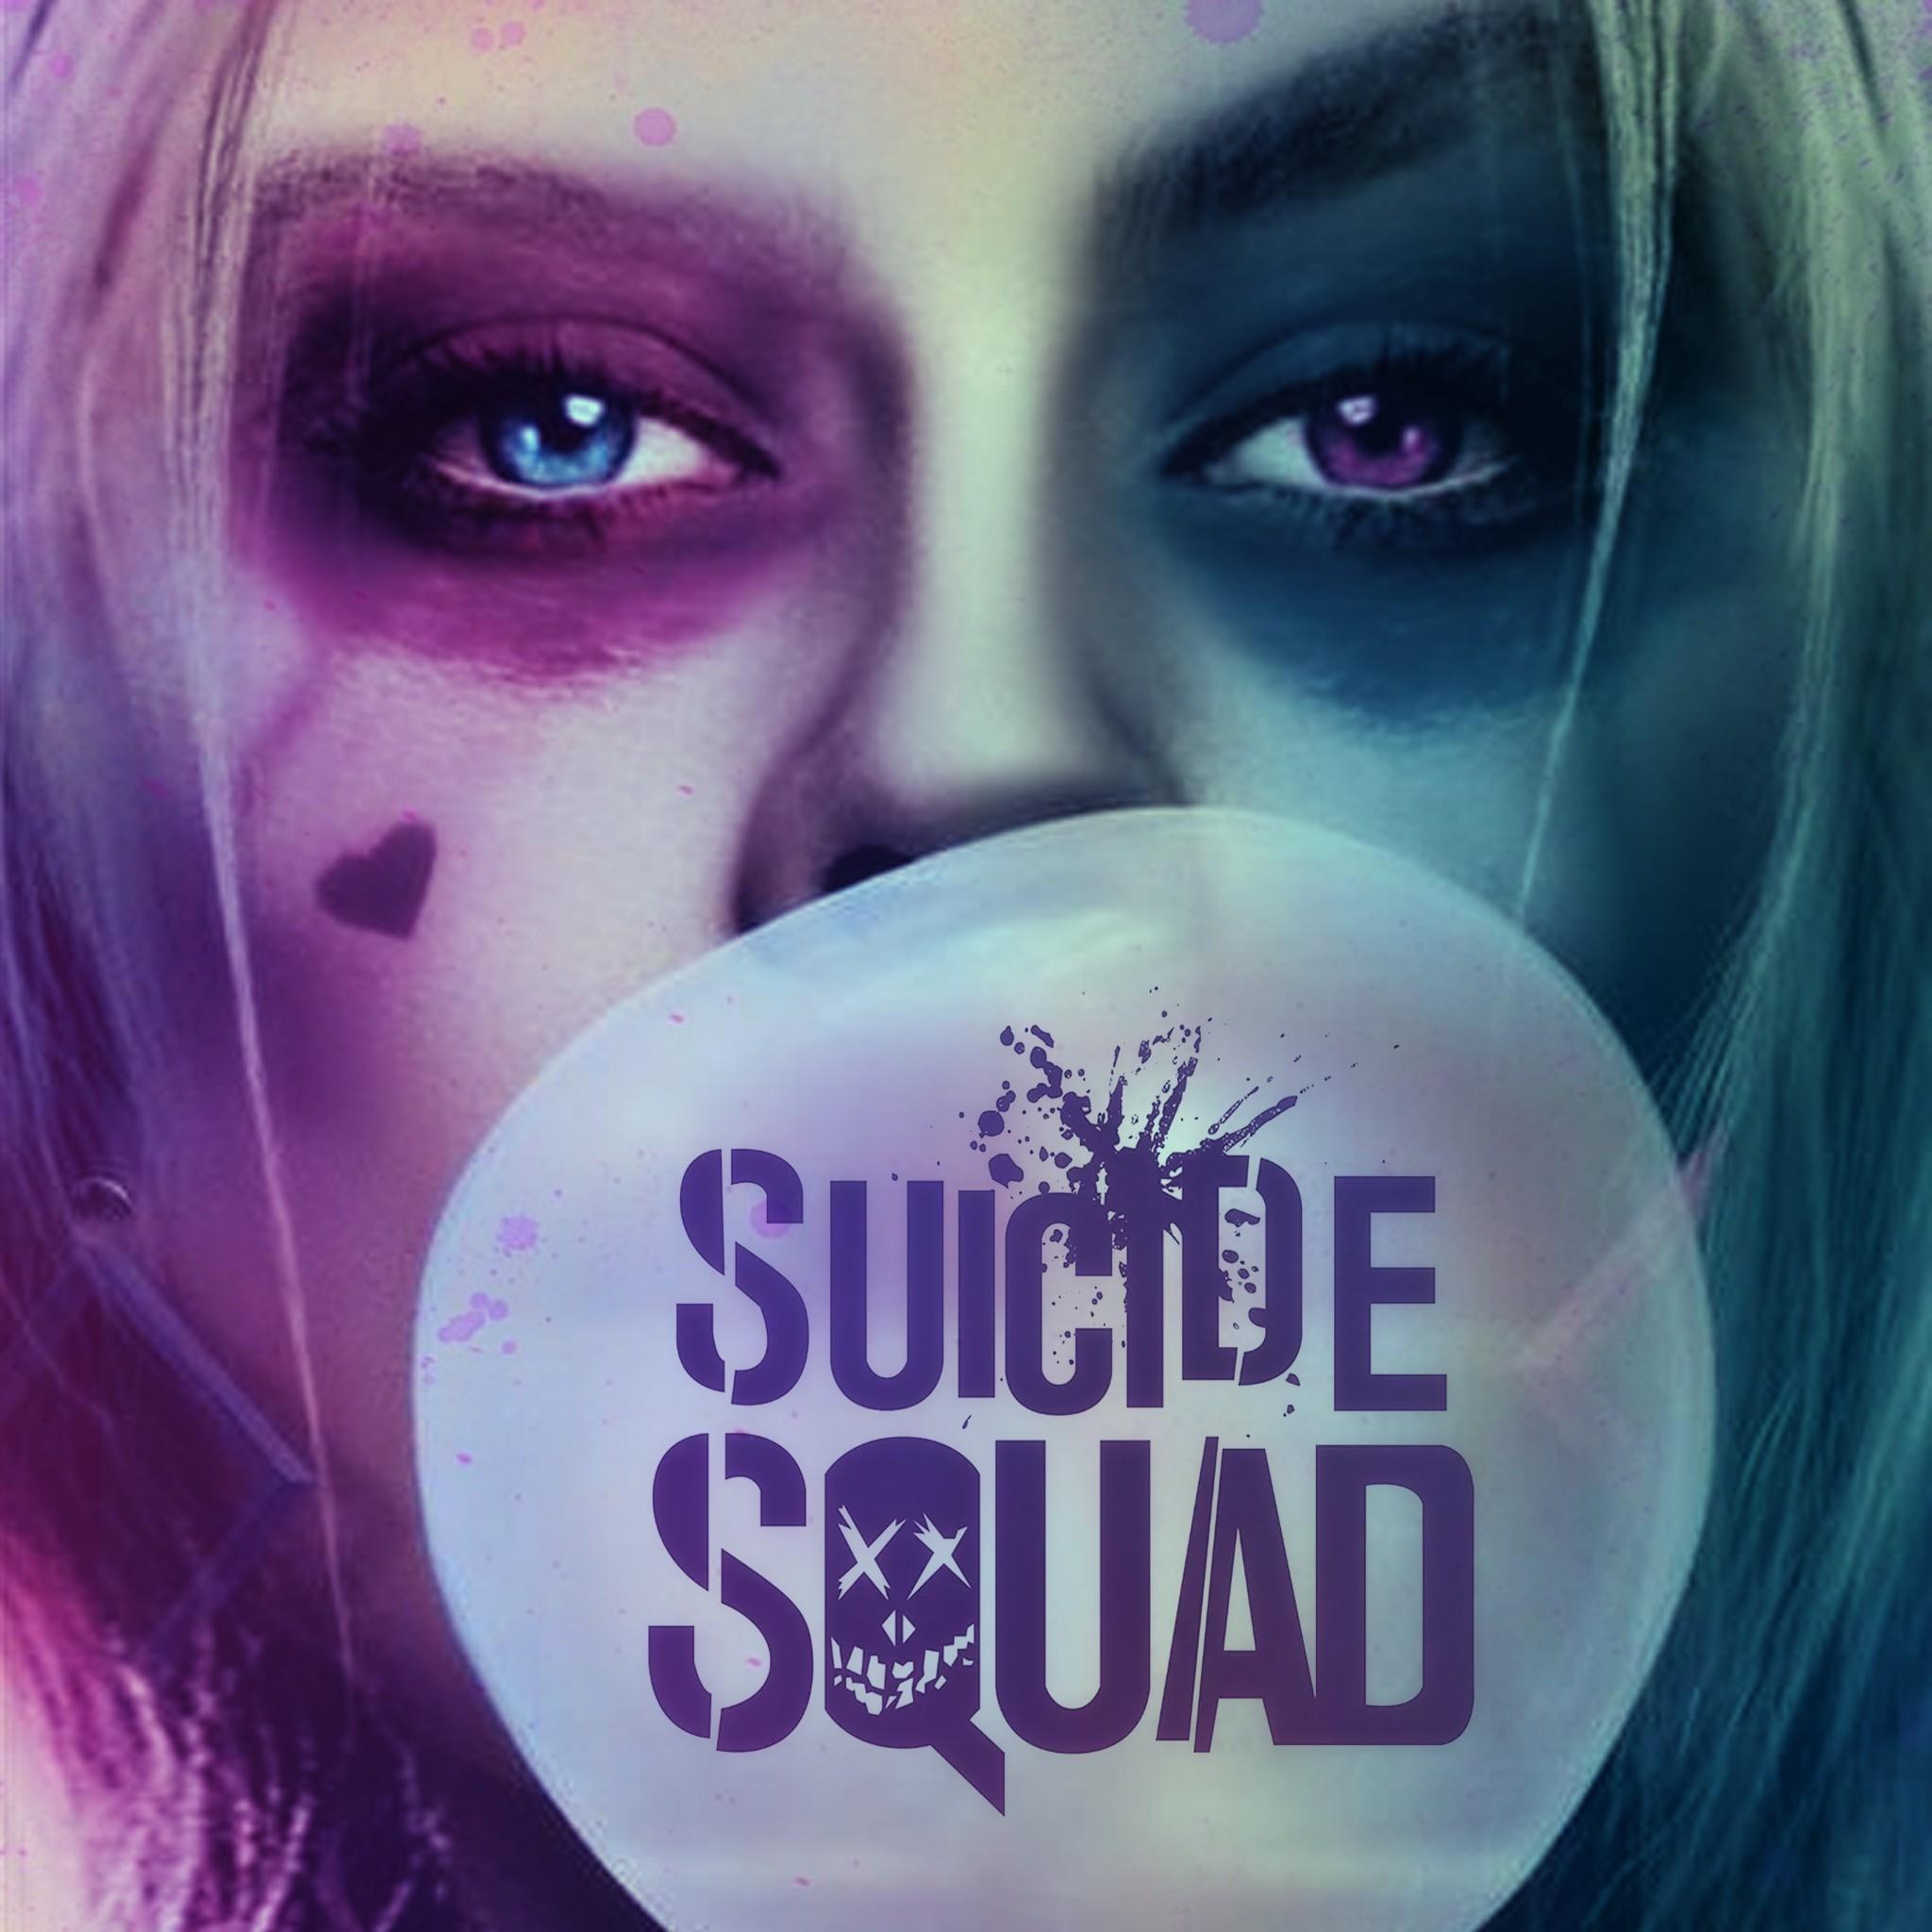 Sucide Squad Wallpapers (75+ images) Suicide Squad Wallpaper